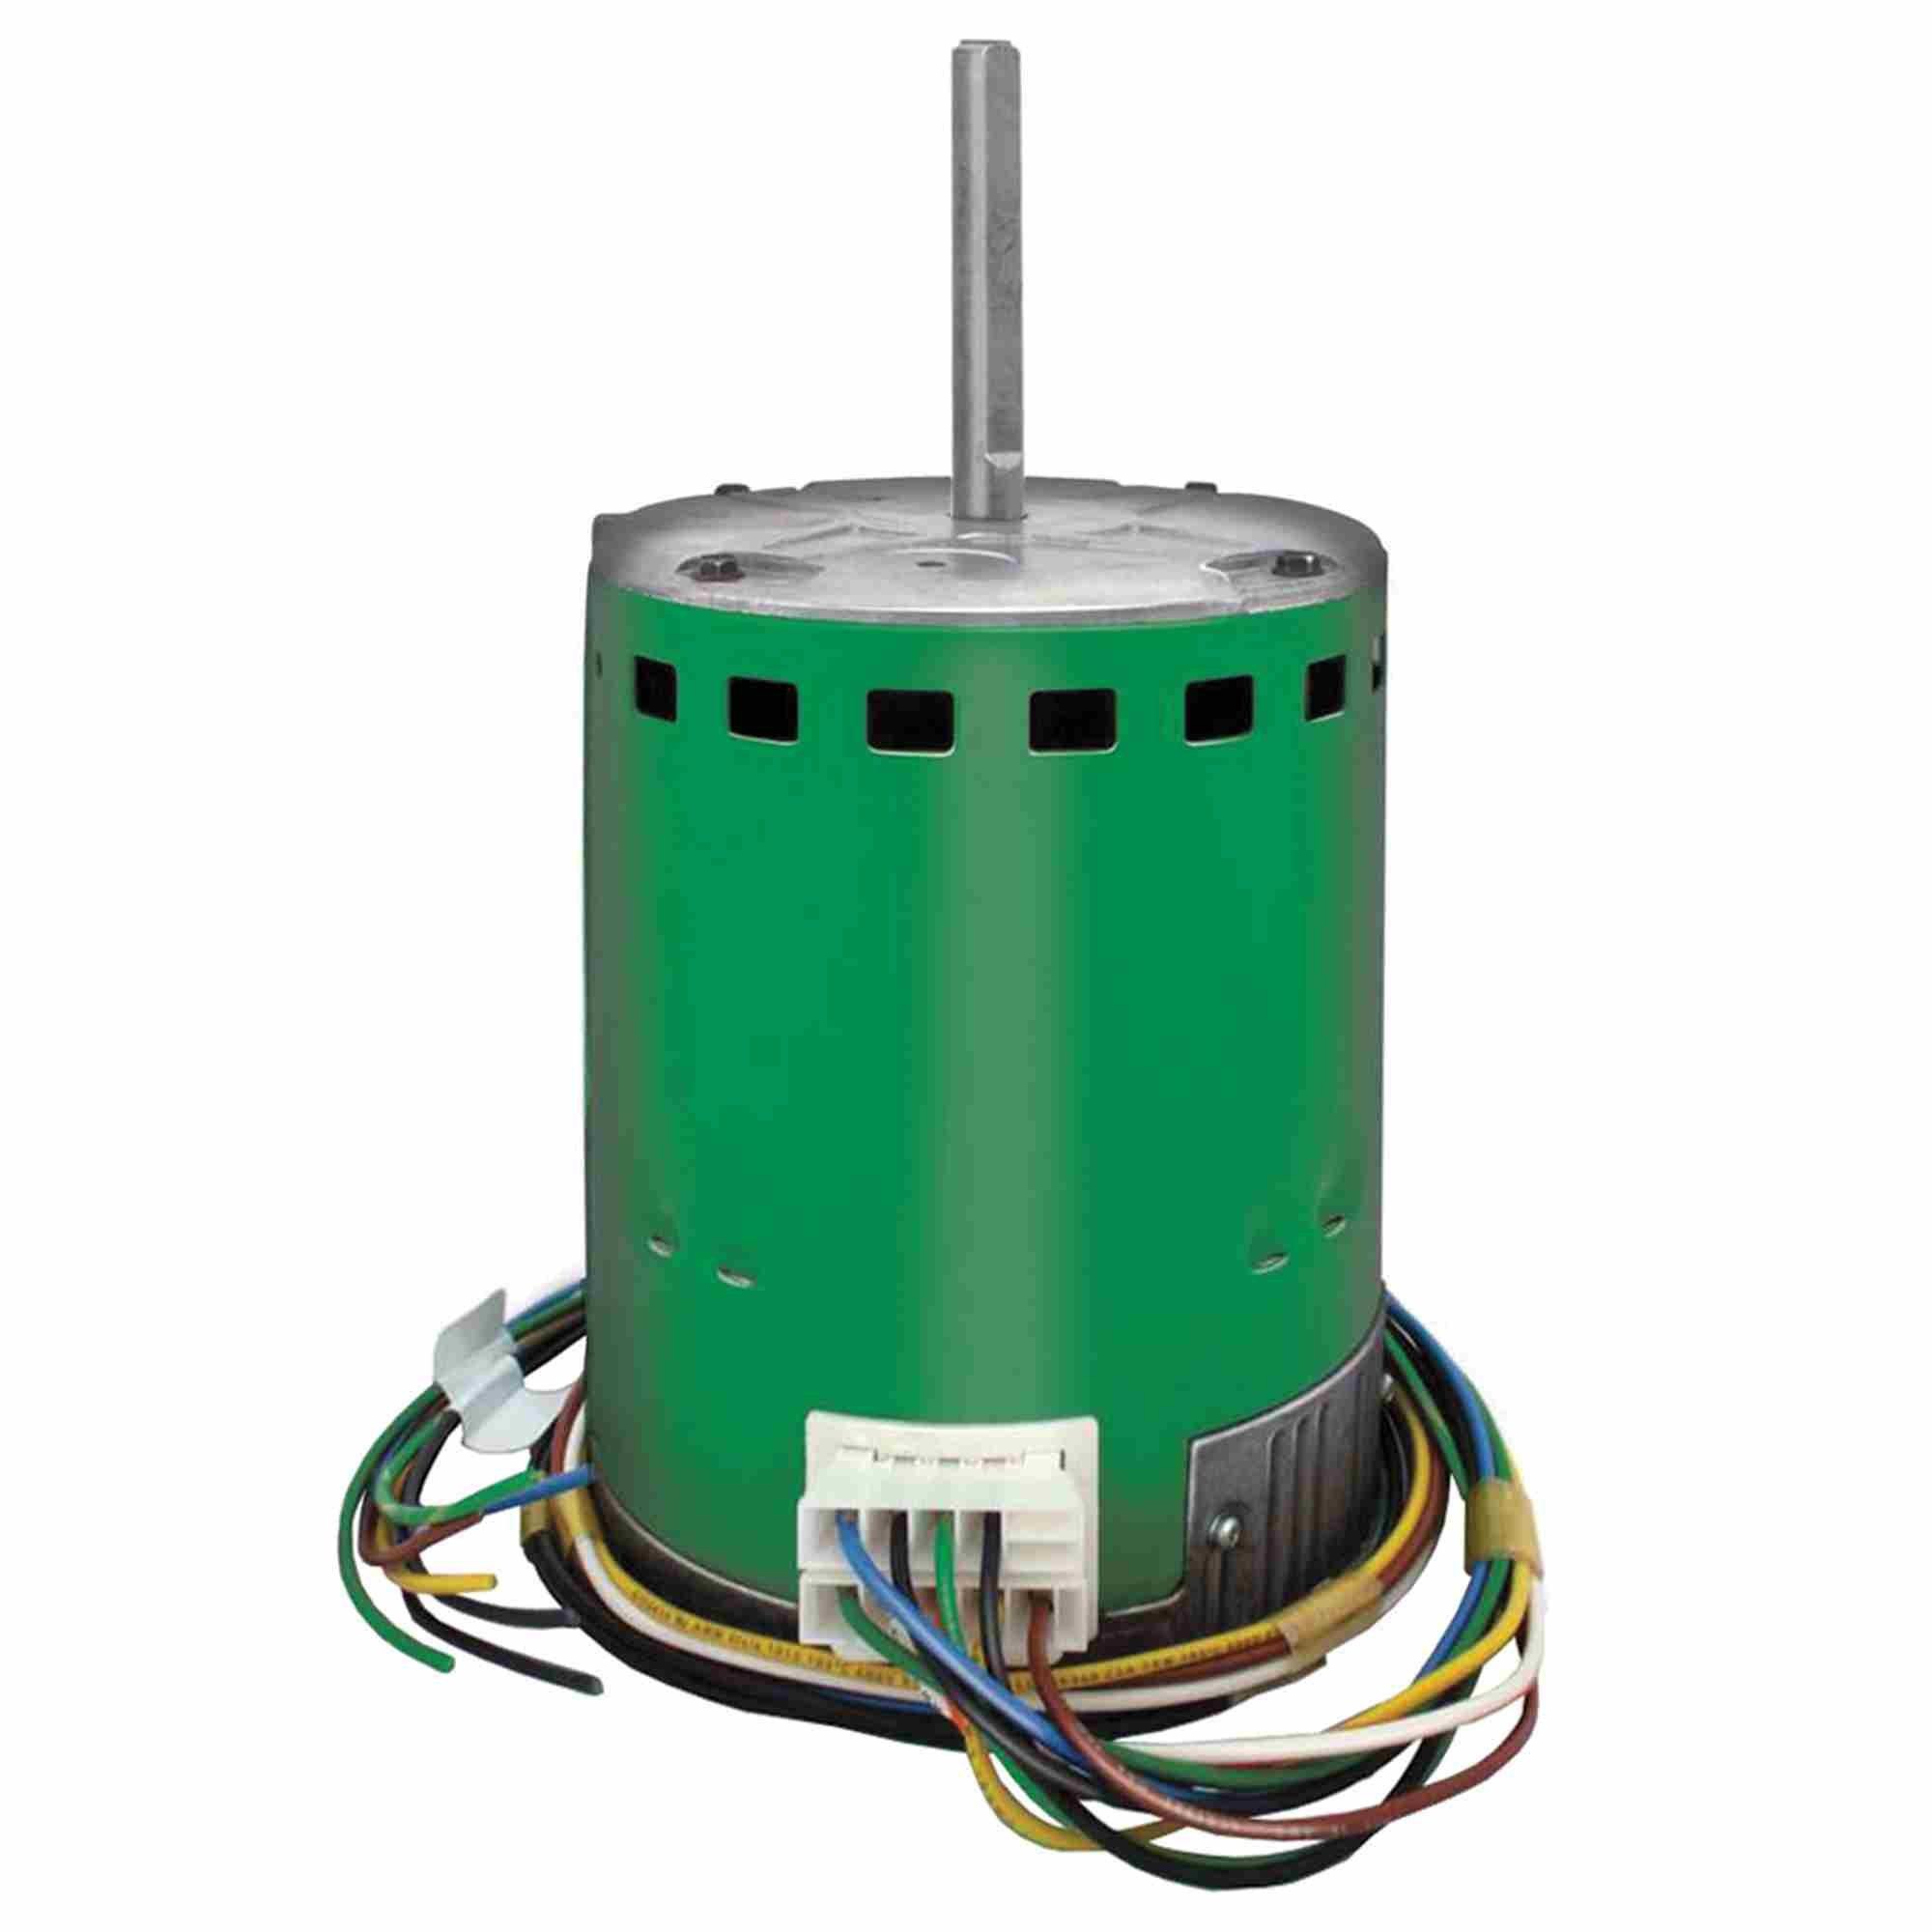 Brushless Direct Drive Blower, ECM, 1/2 HP